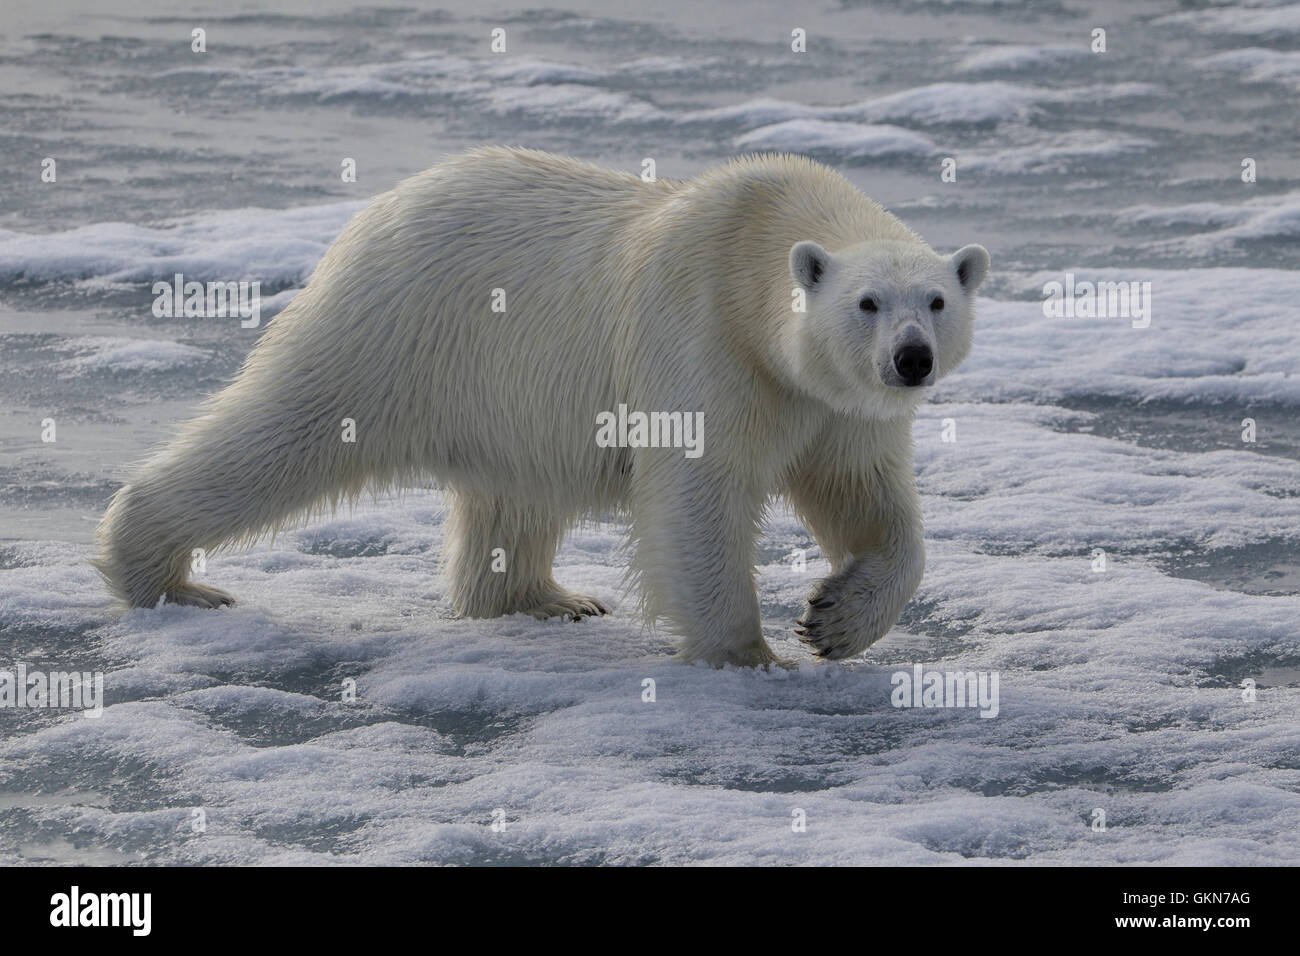 Orso polare, Ursus Maritimus, Passeggiate sul ghiaccio, Svalbard artico. Immagini Stock